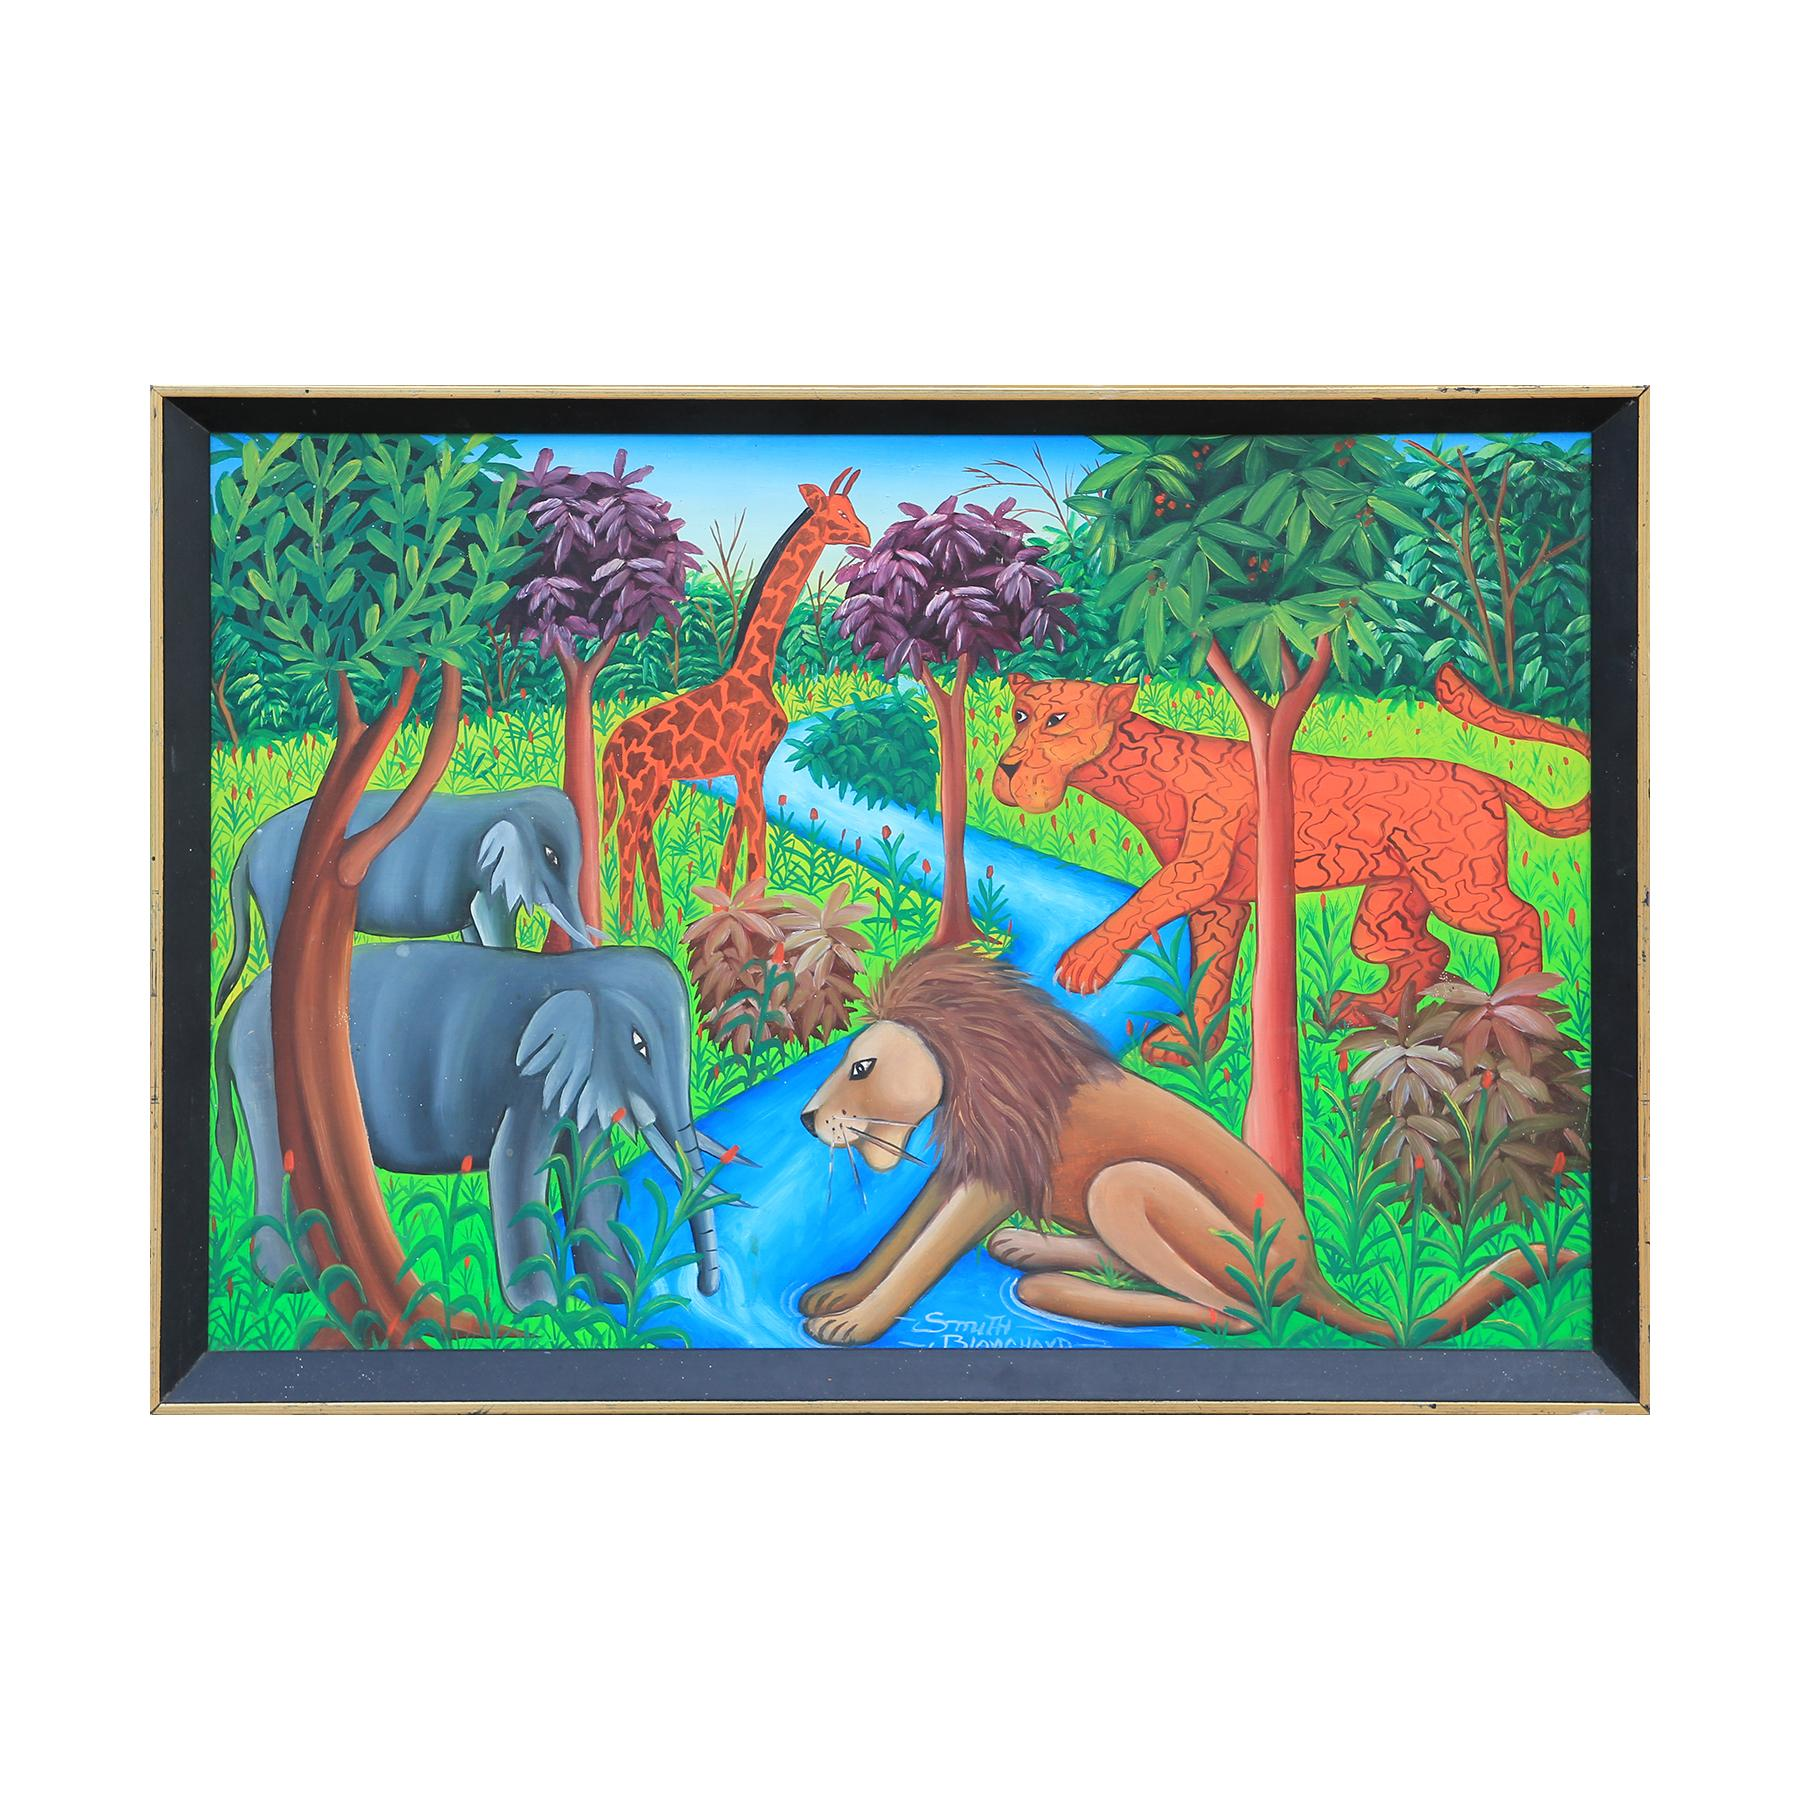 Surrealist Jungle Animals Painting by Haitian Artist